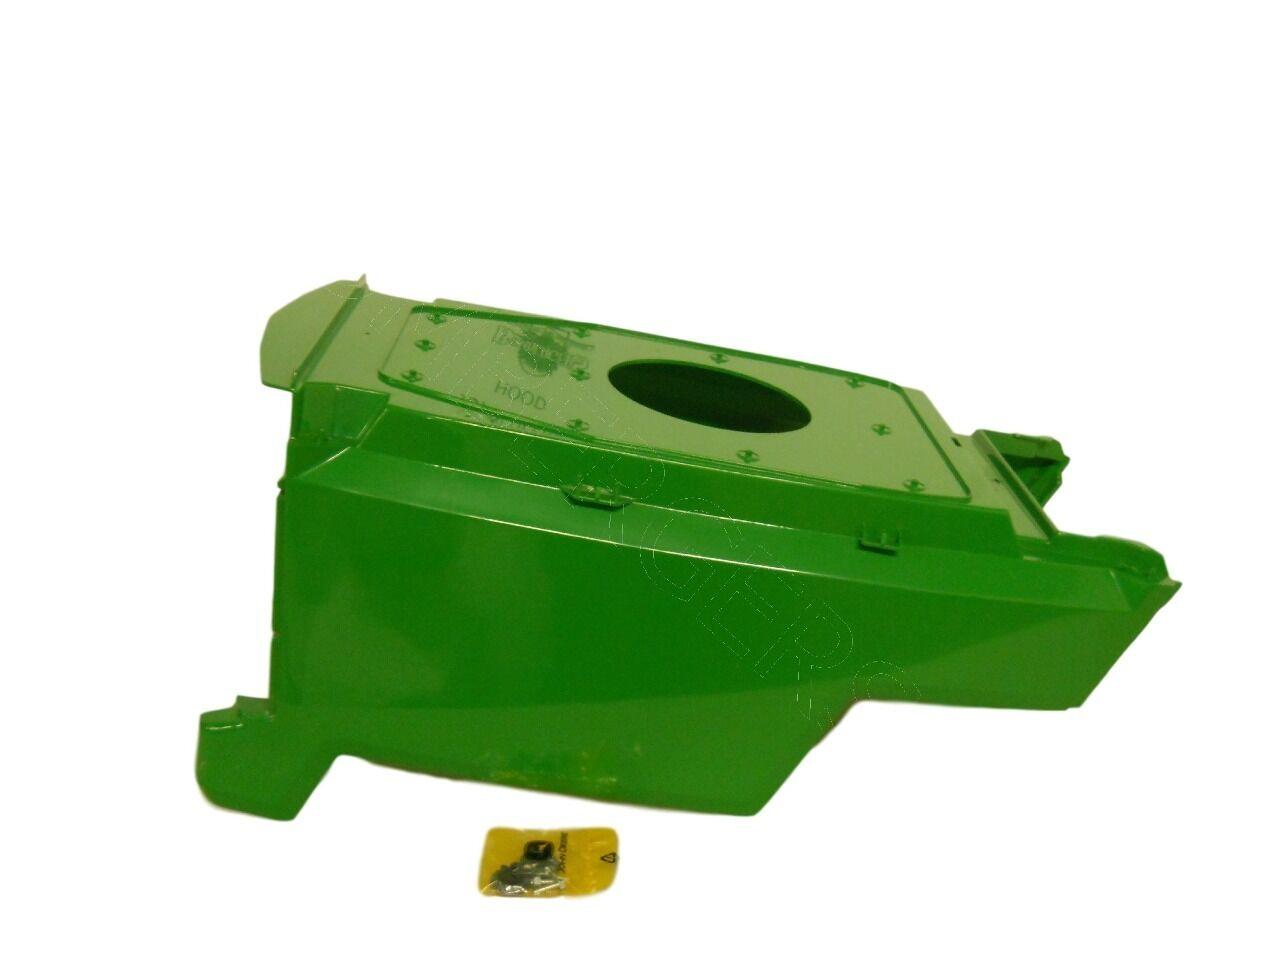 hight resolution of john deere lx172 lx174 lx176 gt275 gt242 gt262 main wiring harness am119295 for sale online ebay